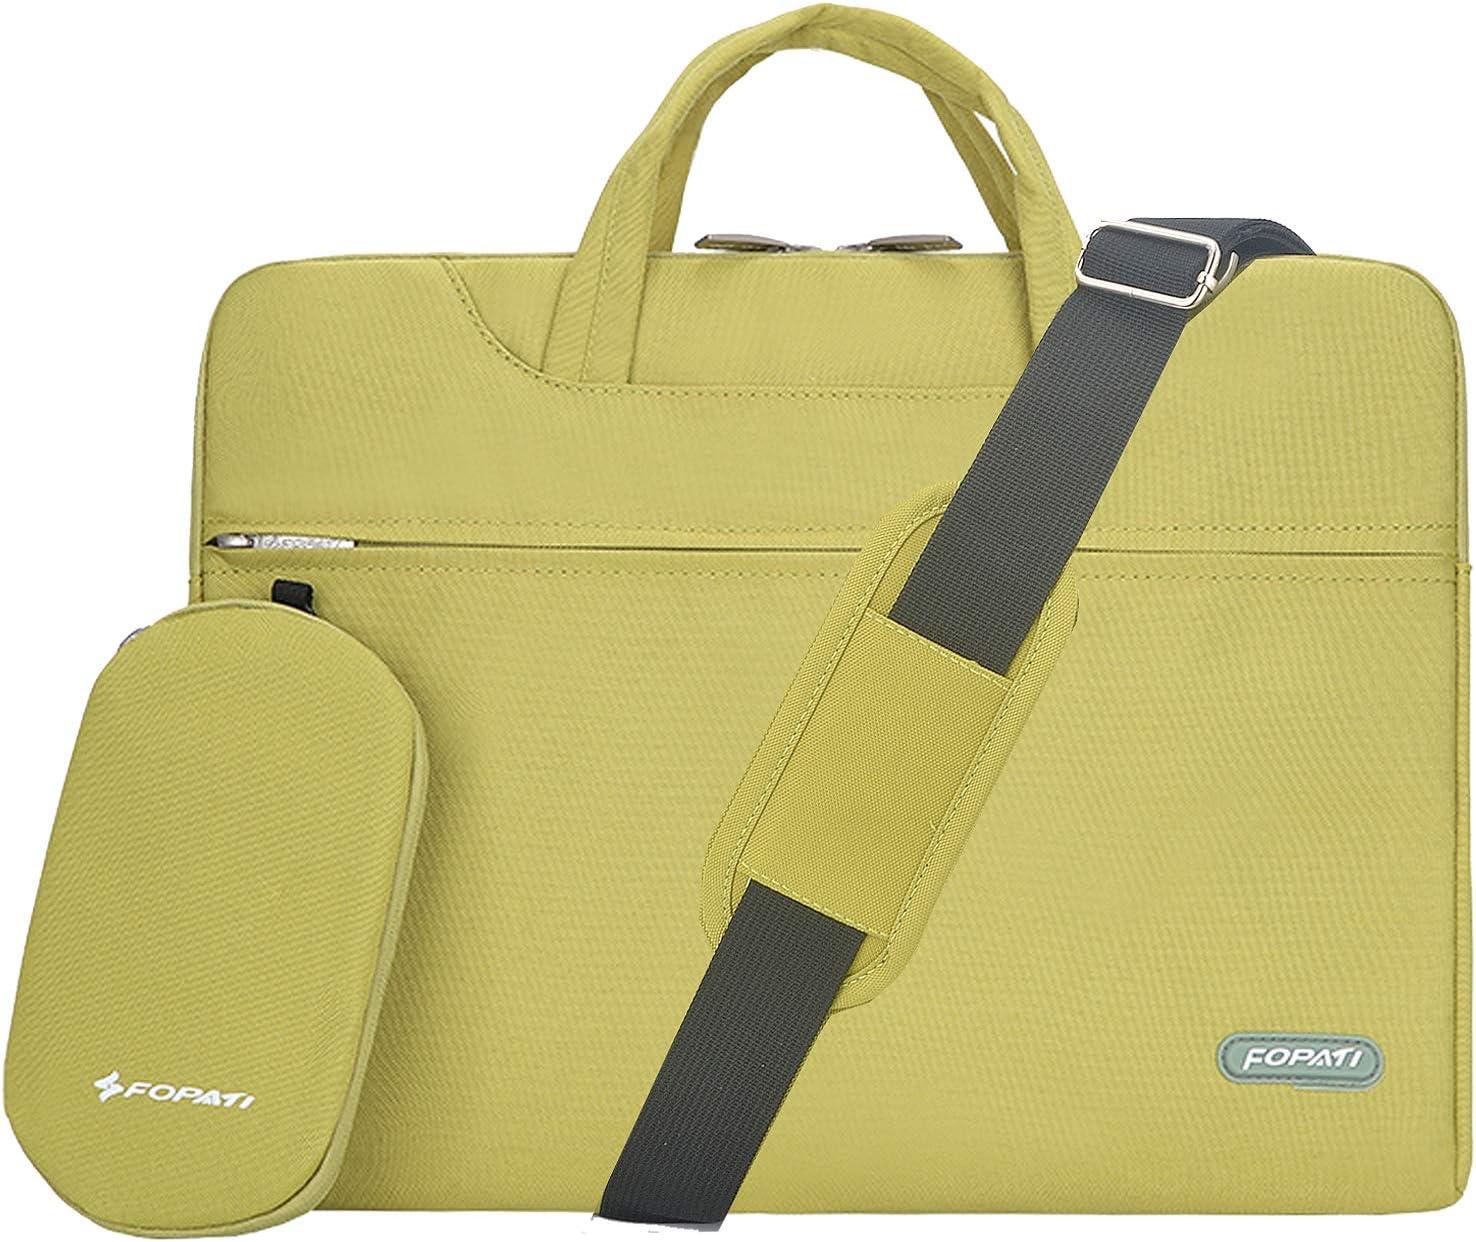 Acer Aspire FOPATI 15-15.6 Inch Laptop Sleeve Case Briefcase Shoulder bag Messenger bag for Macbook Pro 15 HP Pavilion Lenovo IdeaPad ASUS X551MA Dell Inspiron Laptop bag 15.6 inch Red